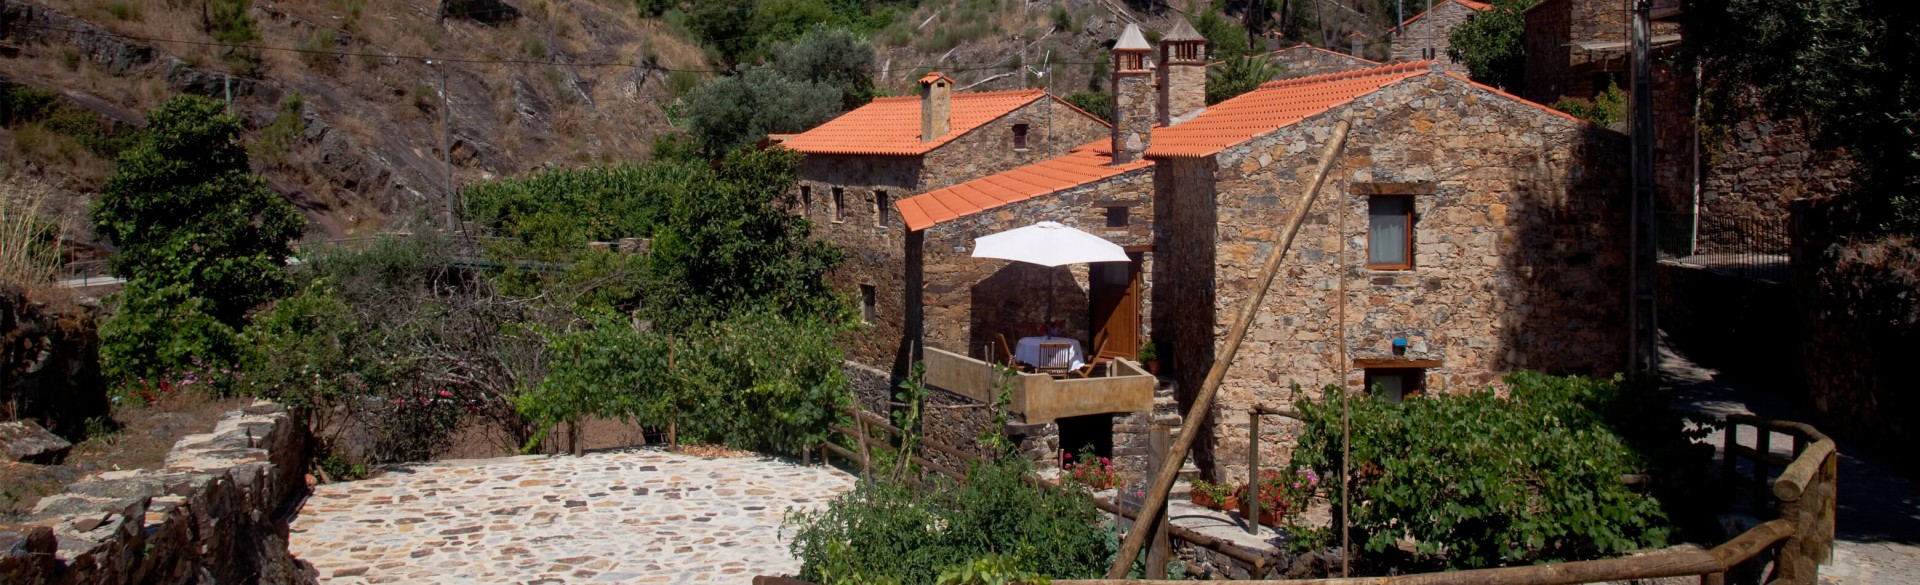 Casa do Forno - Casas de Água Formosa